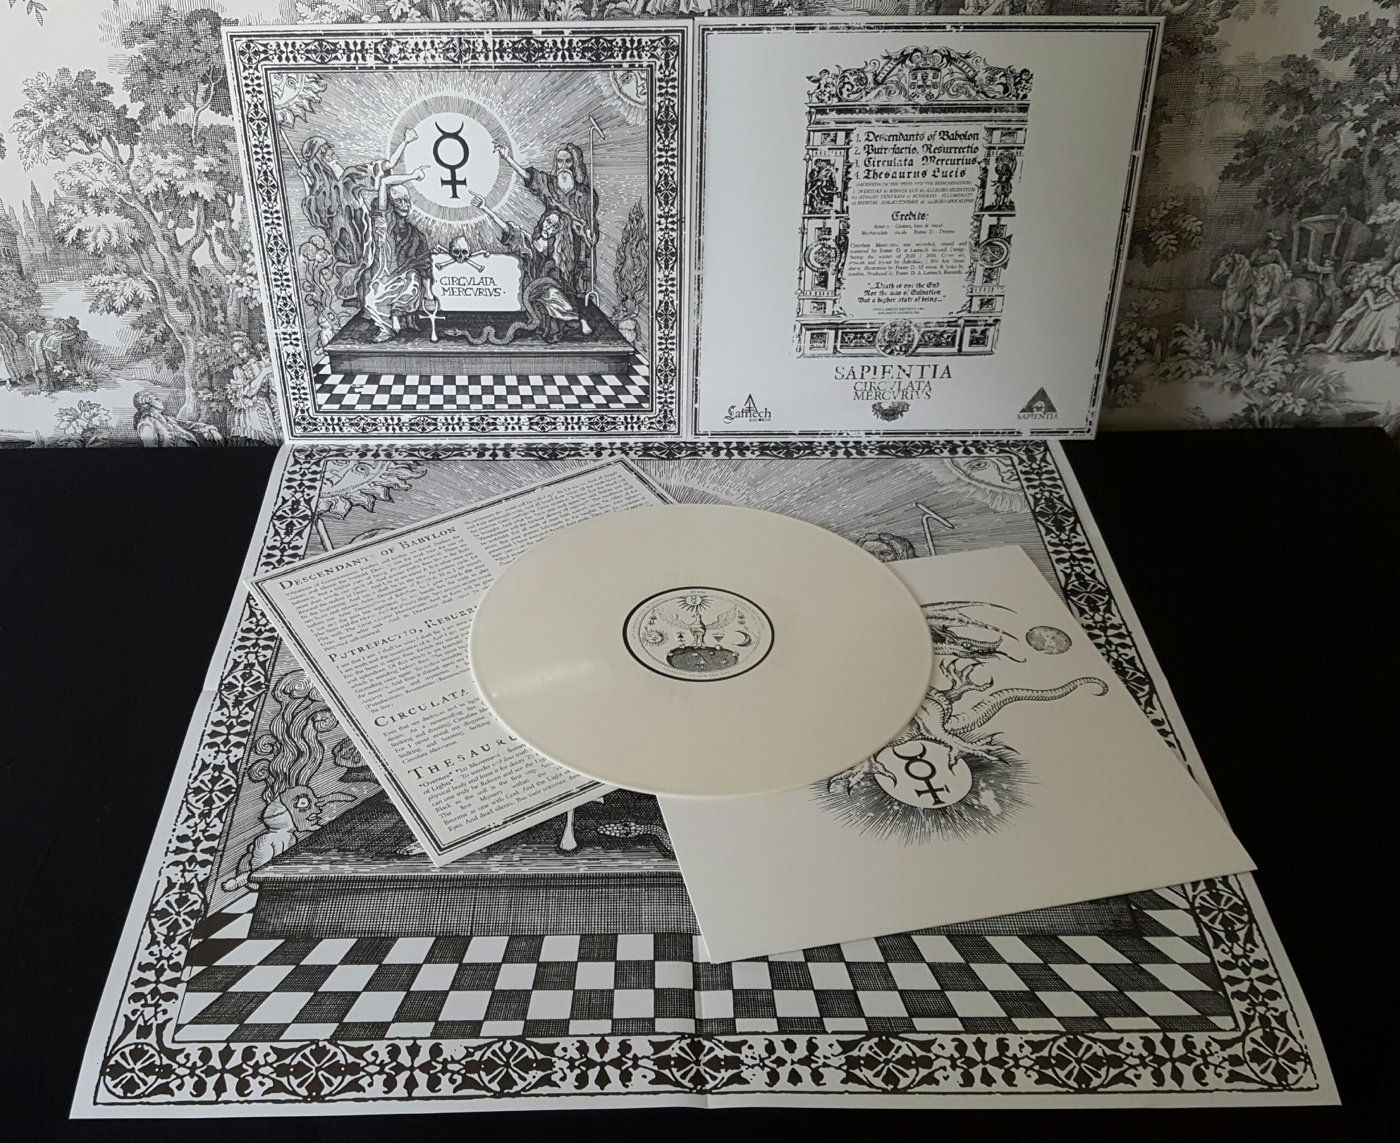 Coloured edition: White vinyl